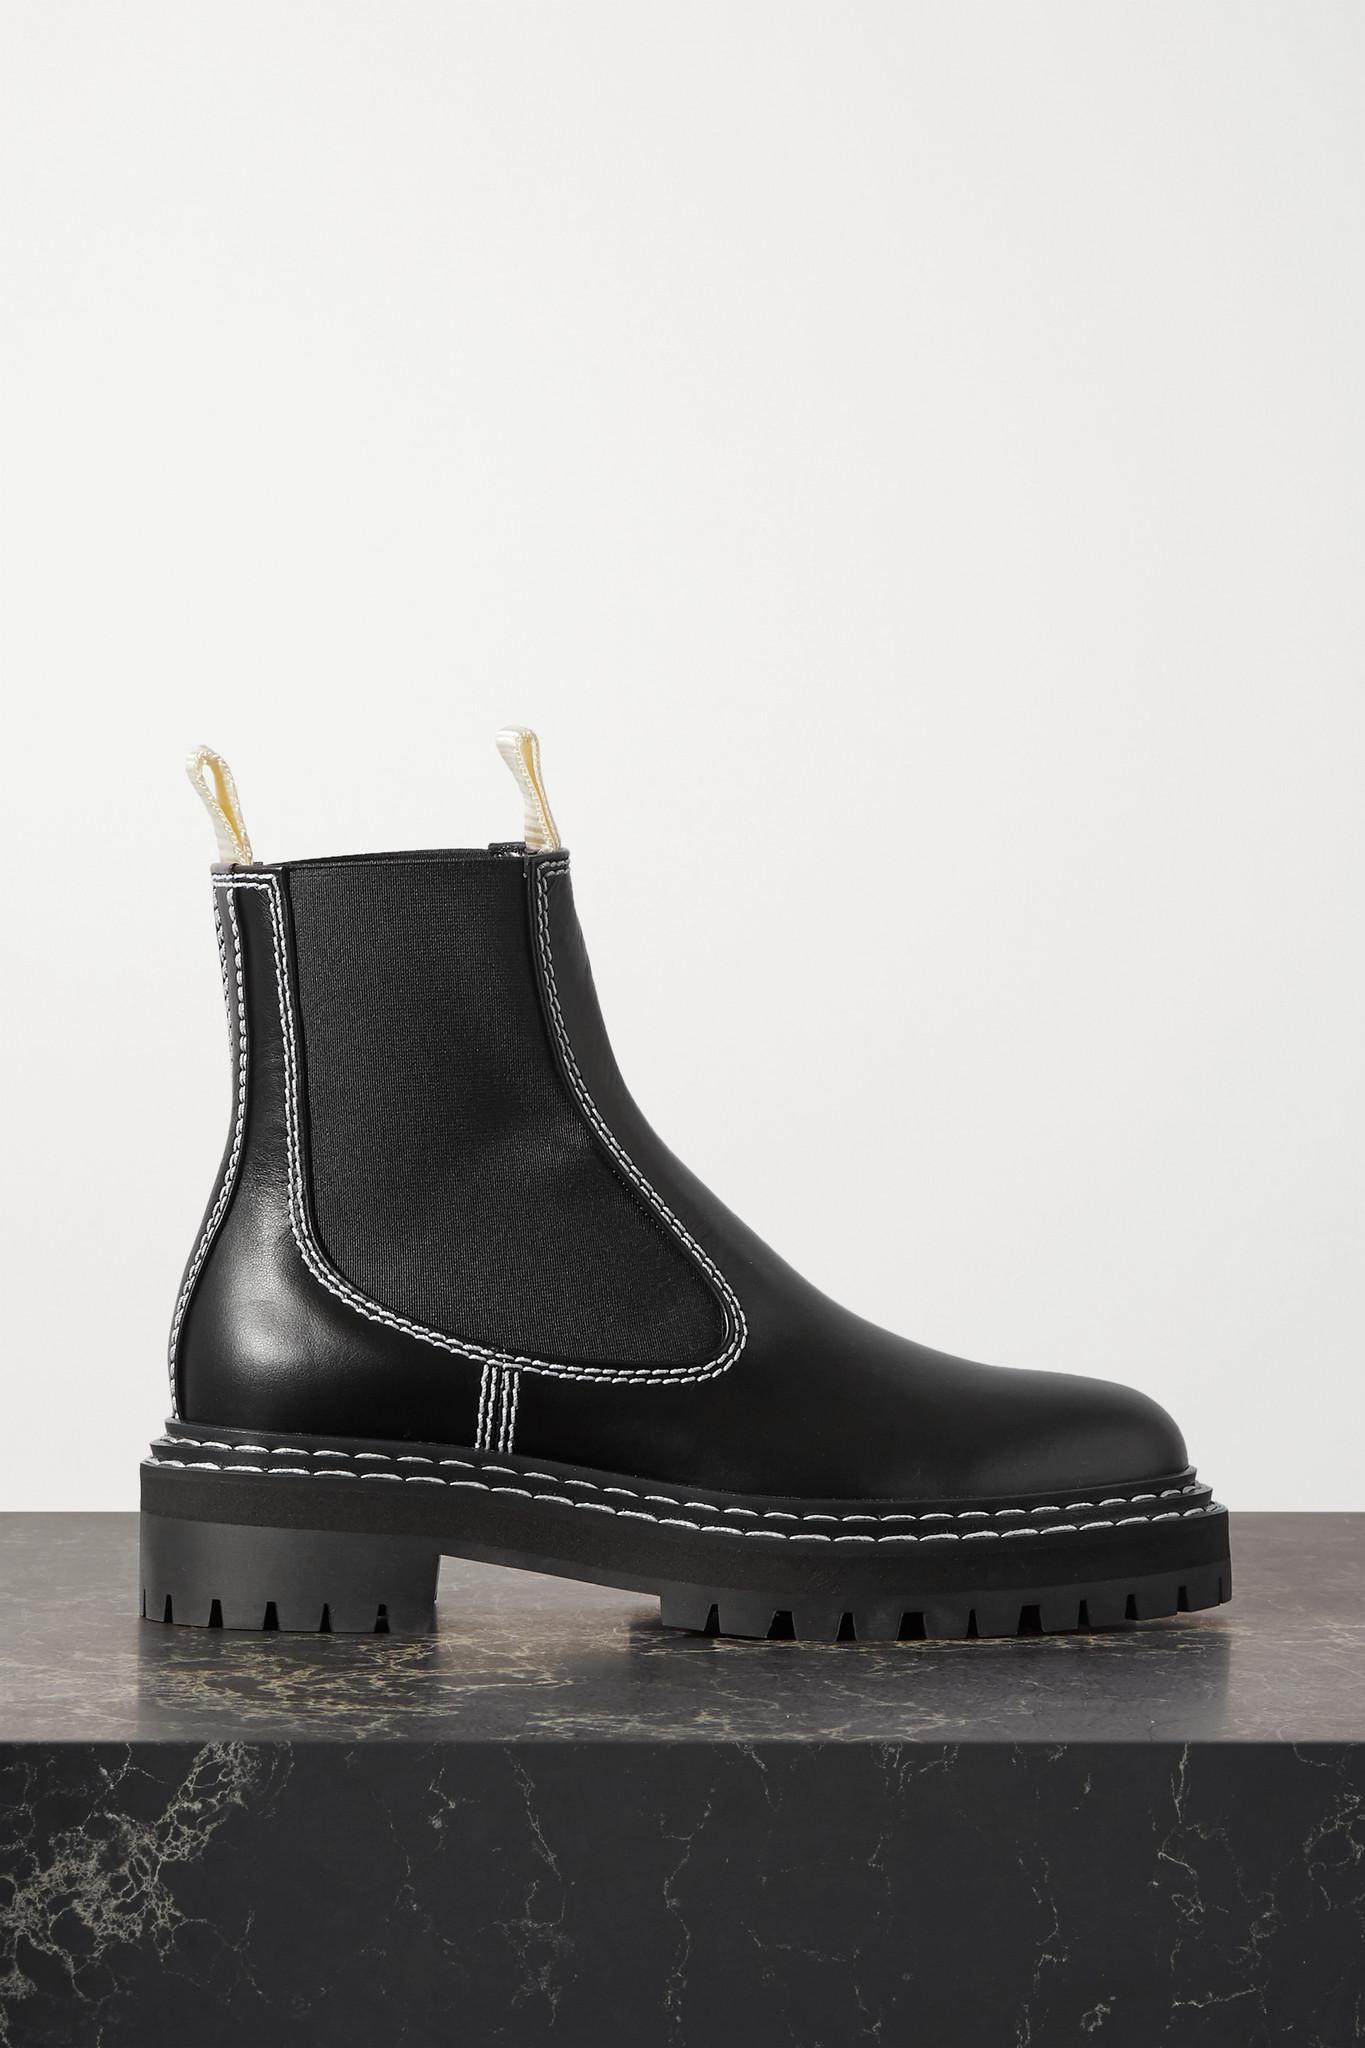 PROENZA SCHOULER - 明线细节皮革切尔西靴 - 黑色 - IT41